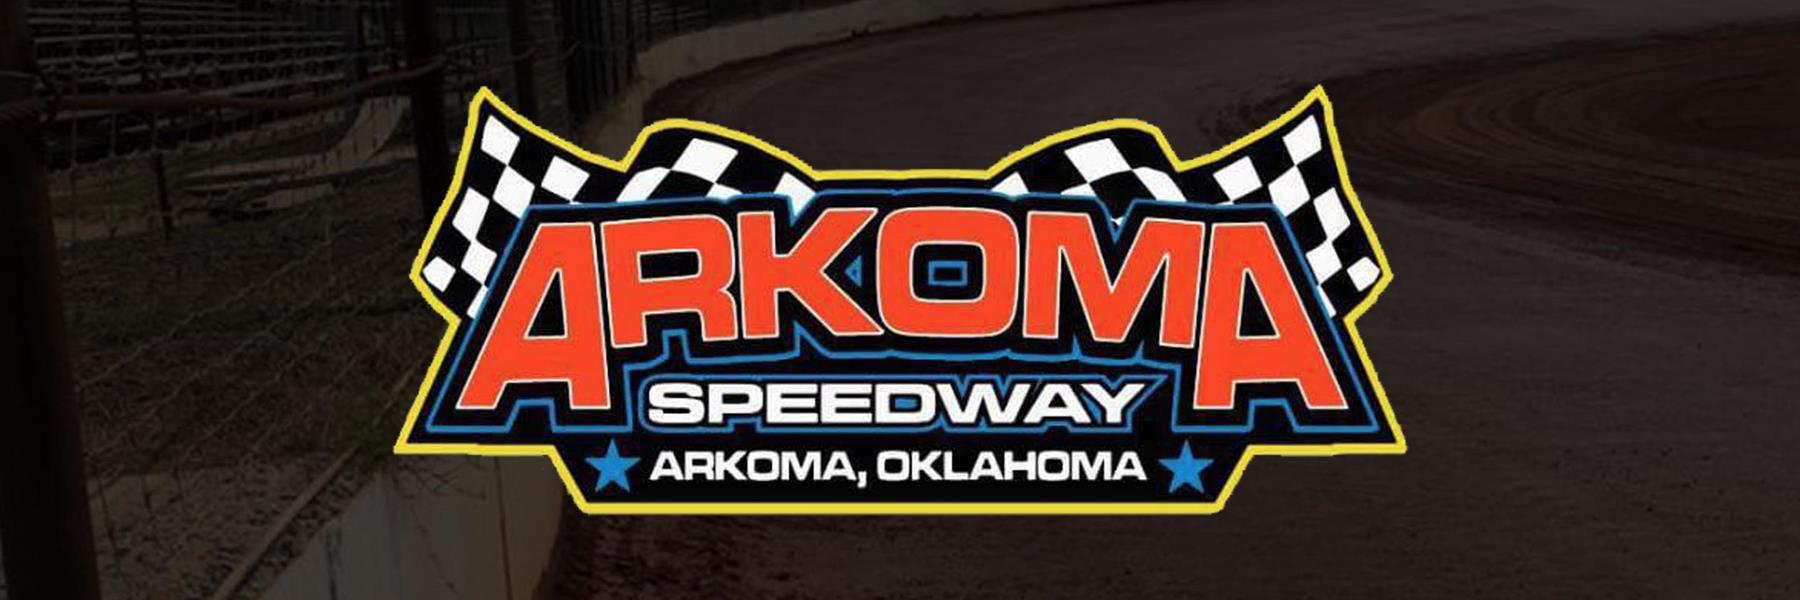 Arkoma Speedway